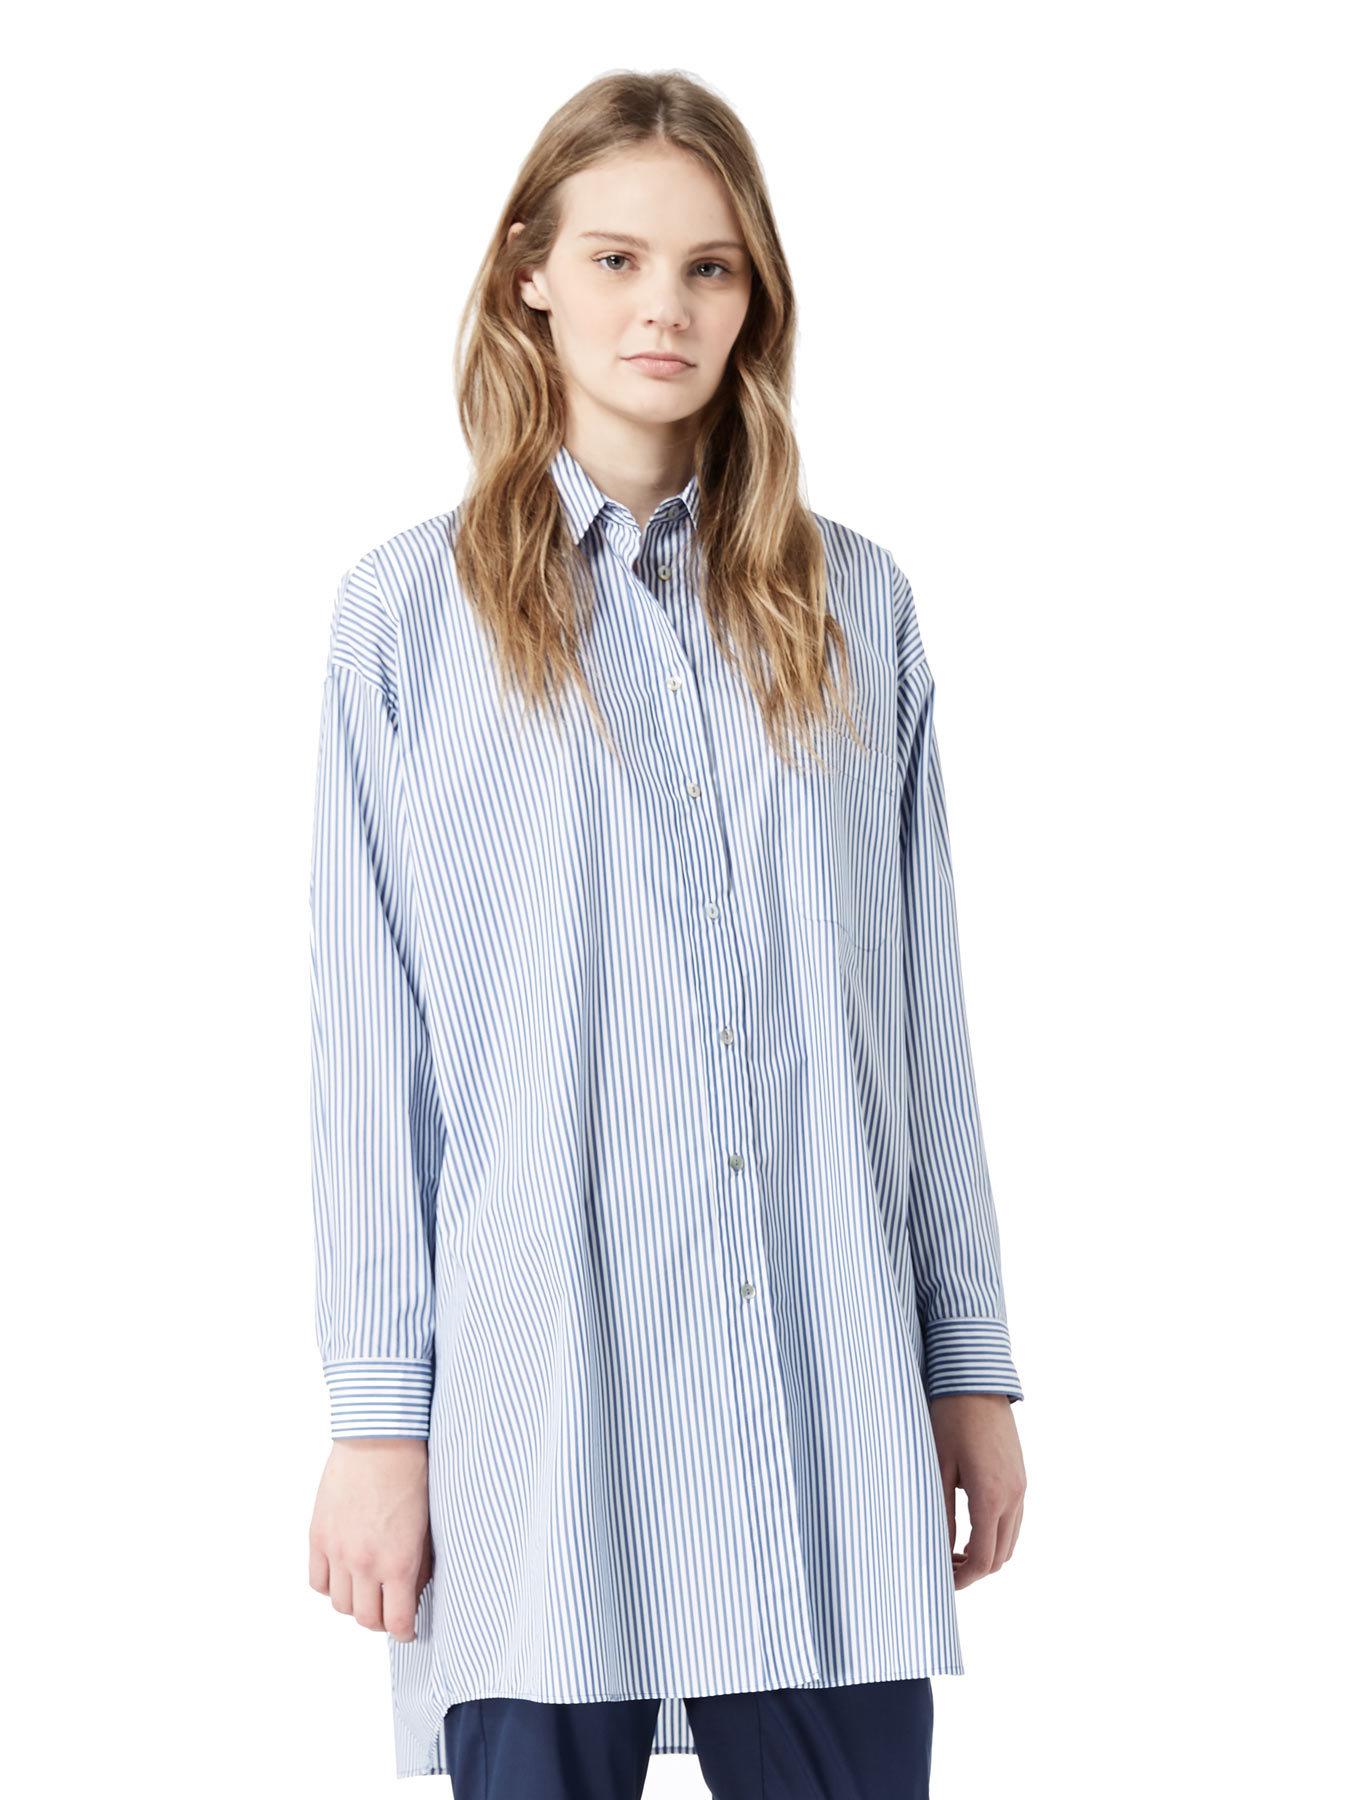 SHIRTS - Shirts iBlues Outlet Brand New Unisex Buy Cheap Shop Offer Fake Free Shipping Extremely Wiki KTKIQkWU